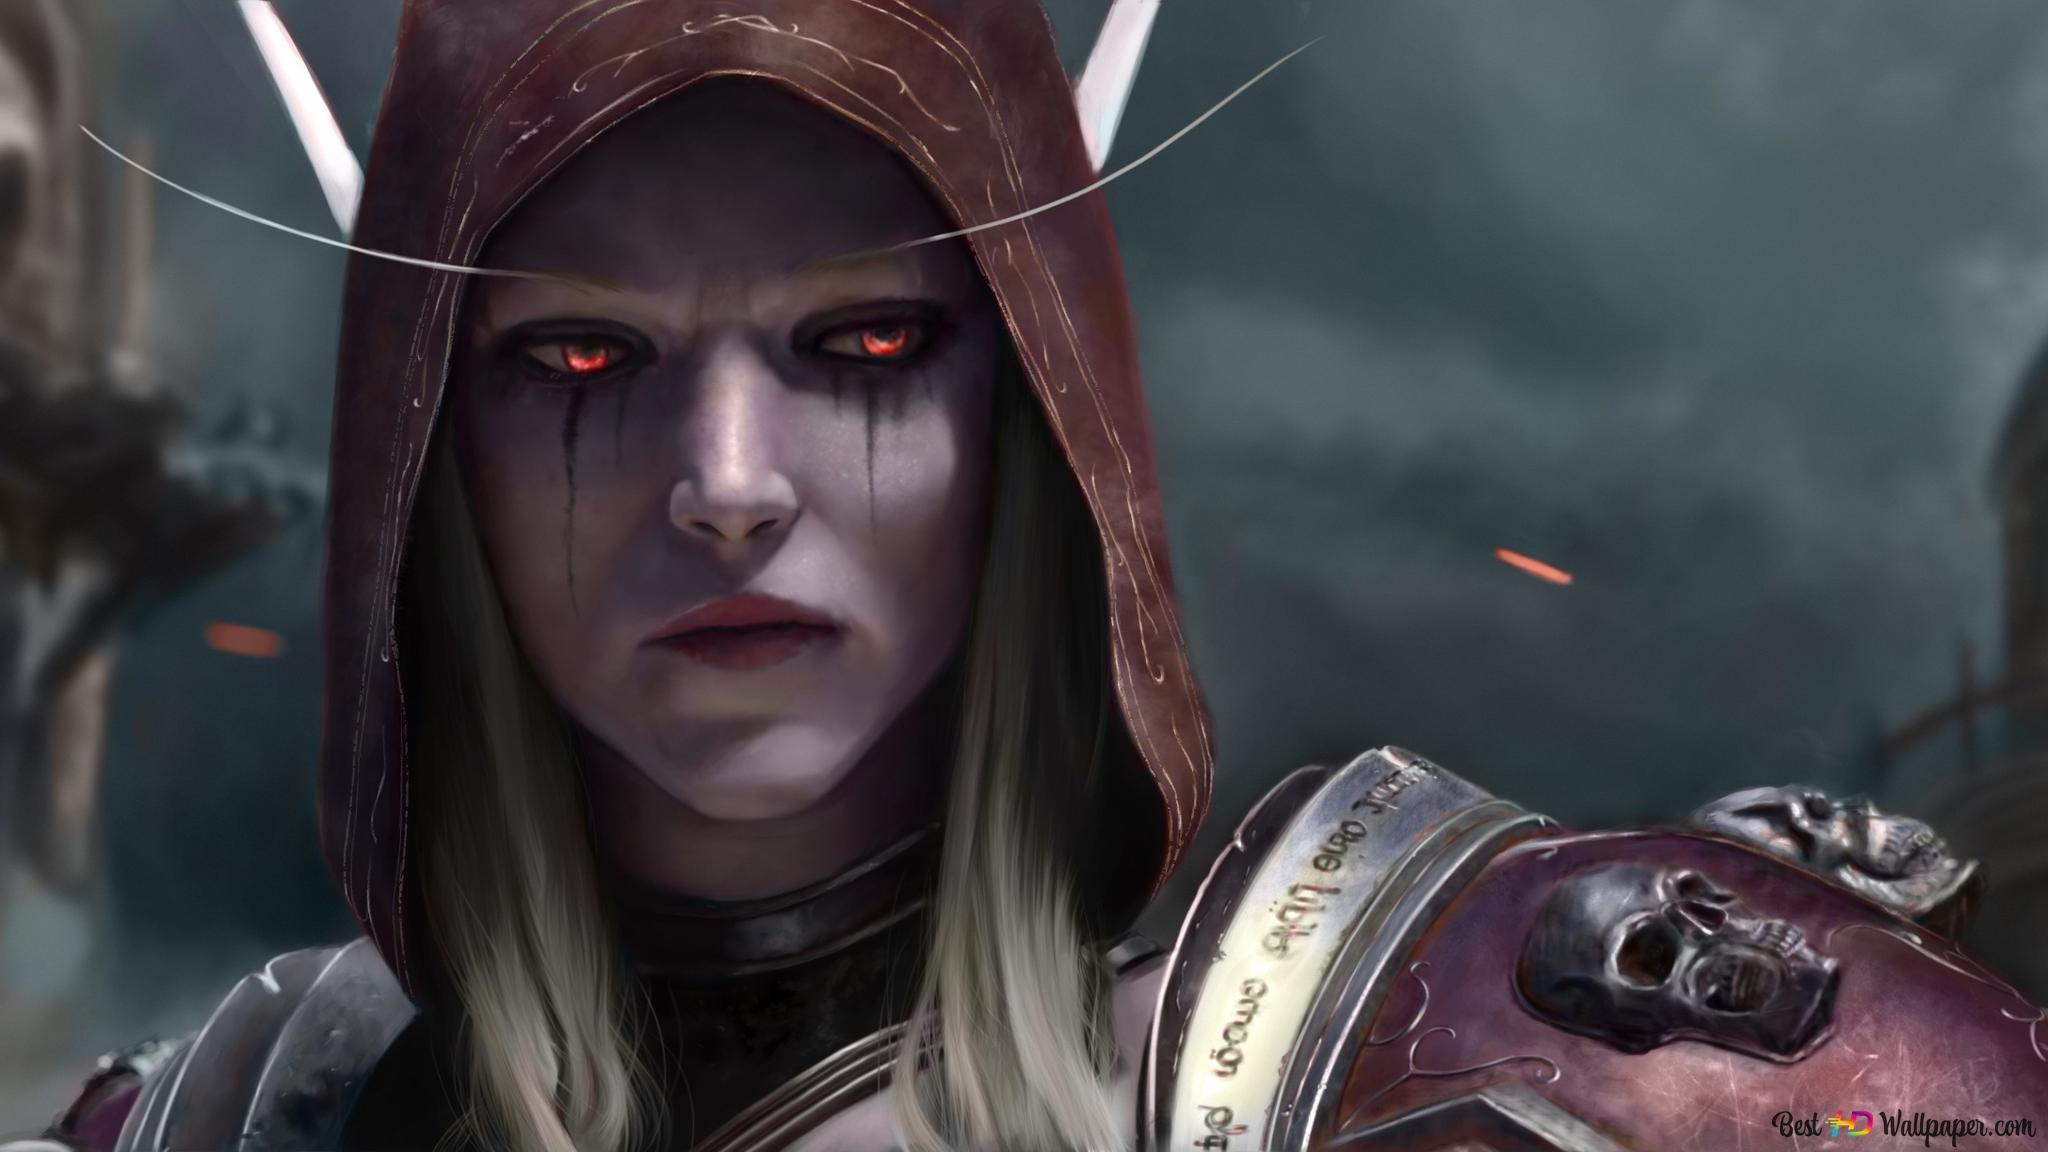 World Of Warcraft Battle For Azeroth Sylvanas Windrunner Hd